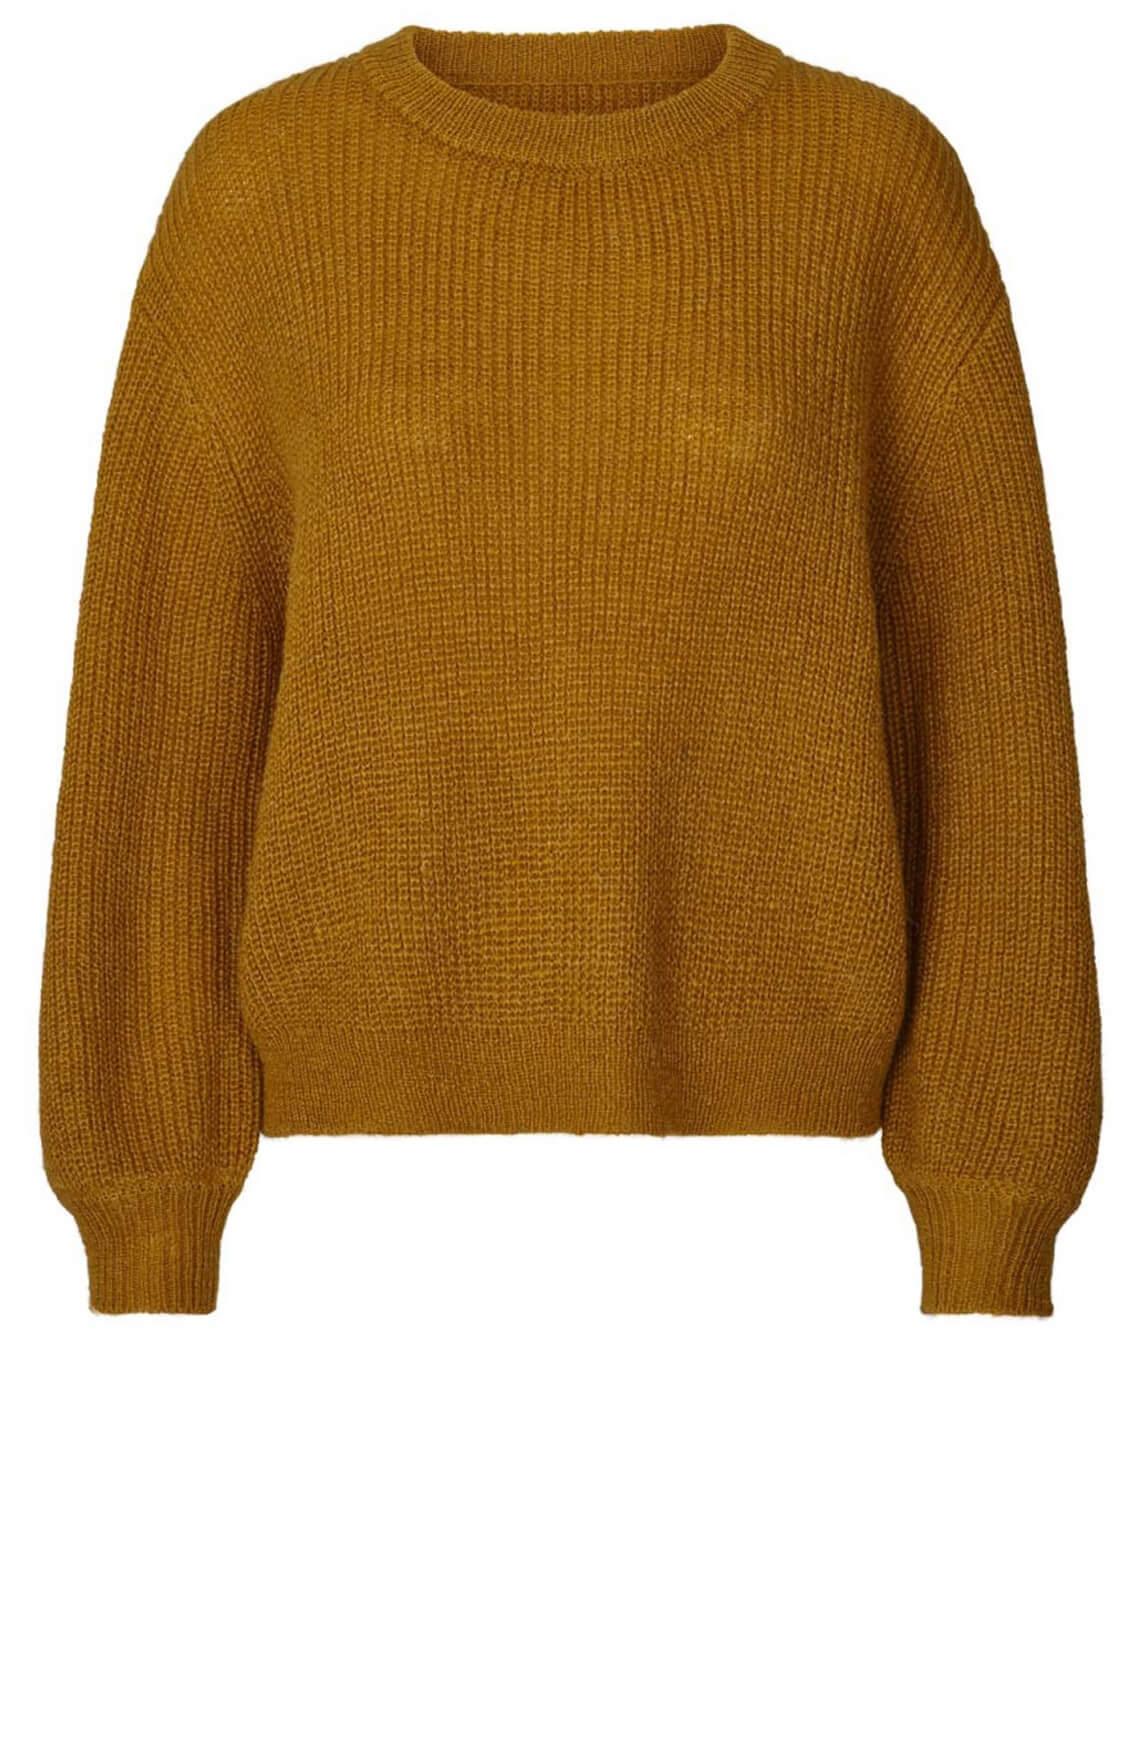 Lollys Laundry Dames Ameli gebreide trui geel